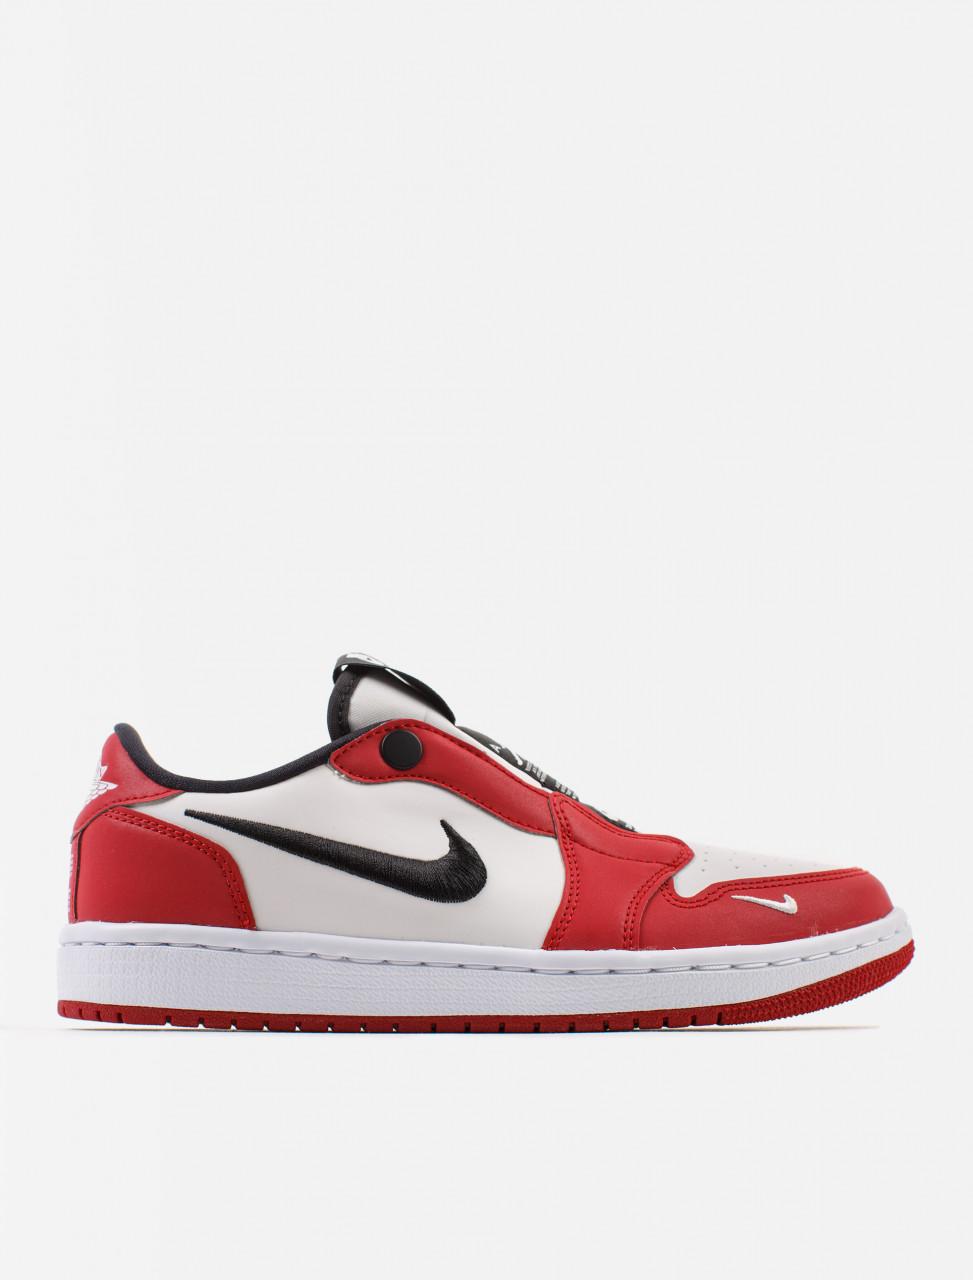 9159e6224cce Nike x Sheila Rashid Air Jordan 1 Retro Low Sneaker